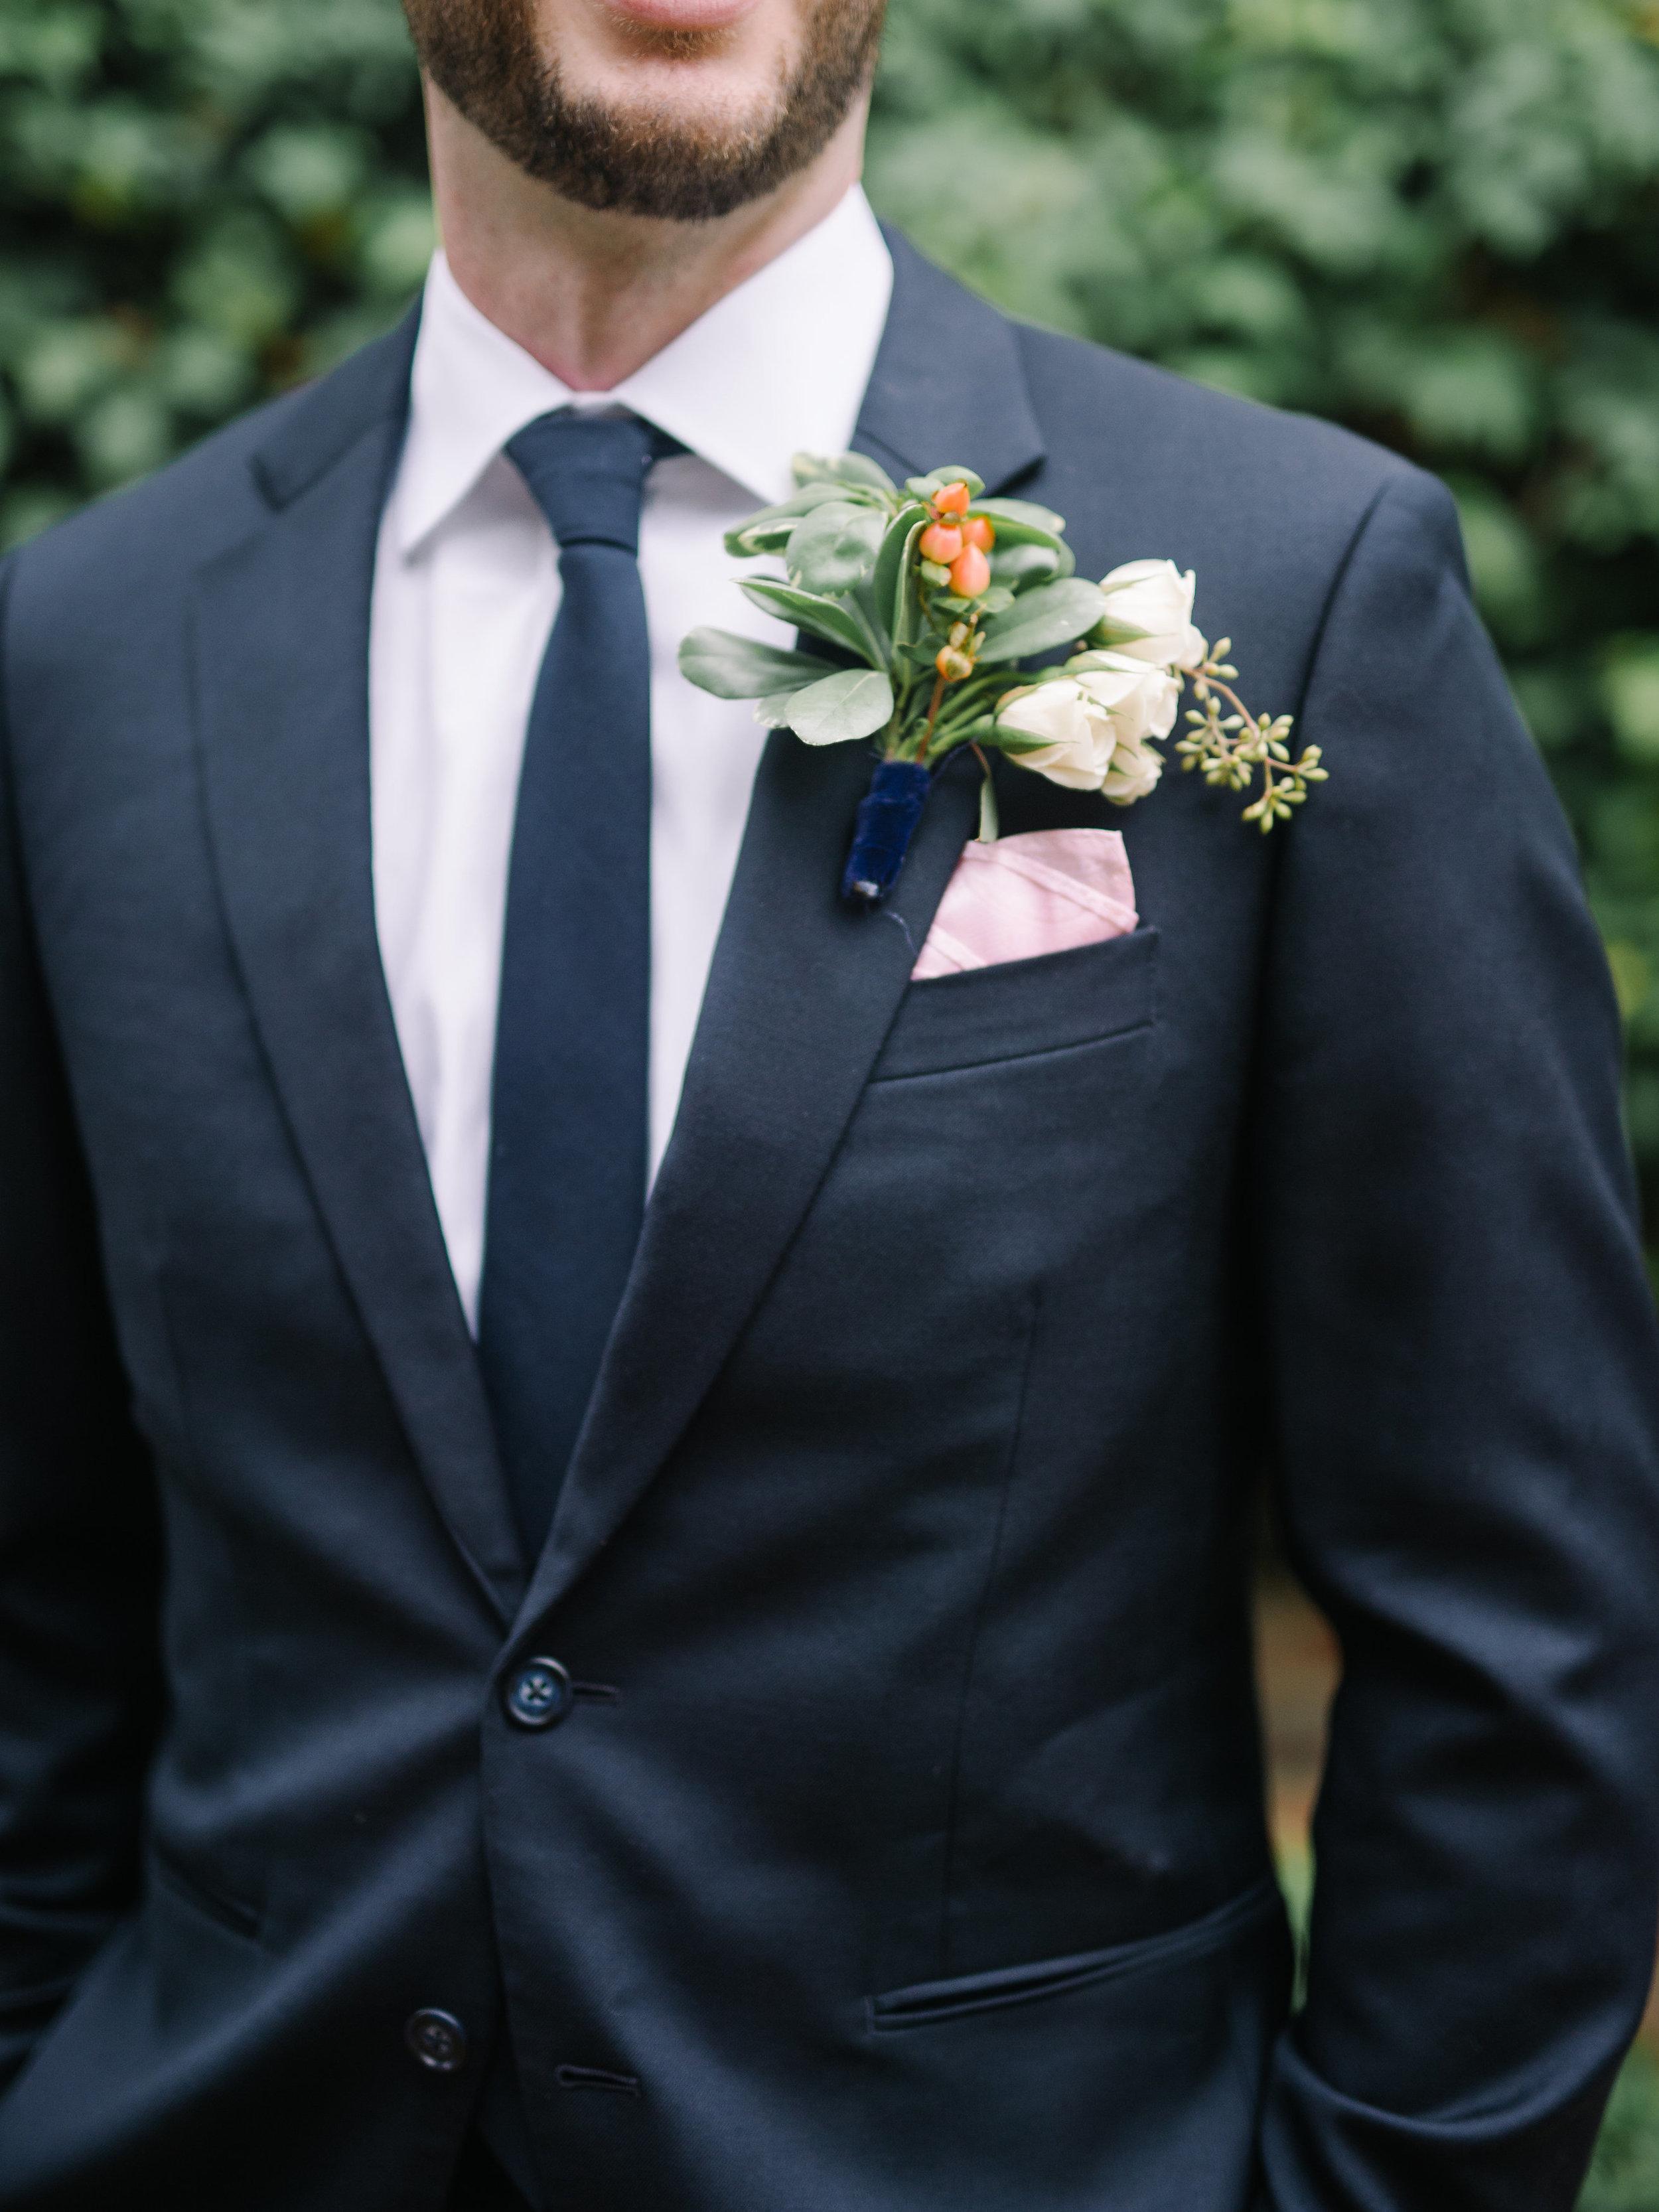 amber-and-paul-rach-loves-troy-charles-h-morris-center-wedding-sarah-seven-helene-lace-wedding-dress-ivory-and-beau-bridal-boutique-savannah-wedding-planner-savannah-event-designer-savannah-florist-savannah-weddings-savannah-bridal-boutique-20.jpg